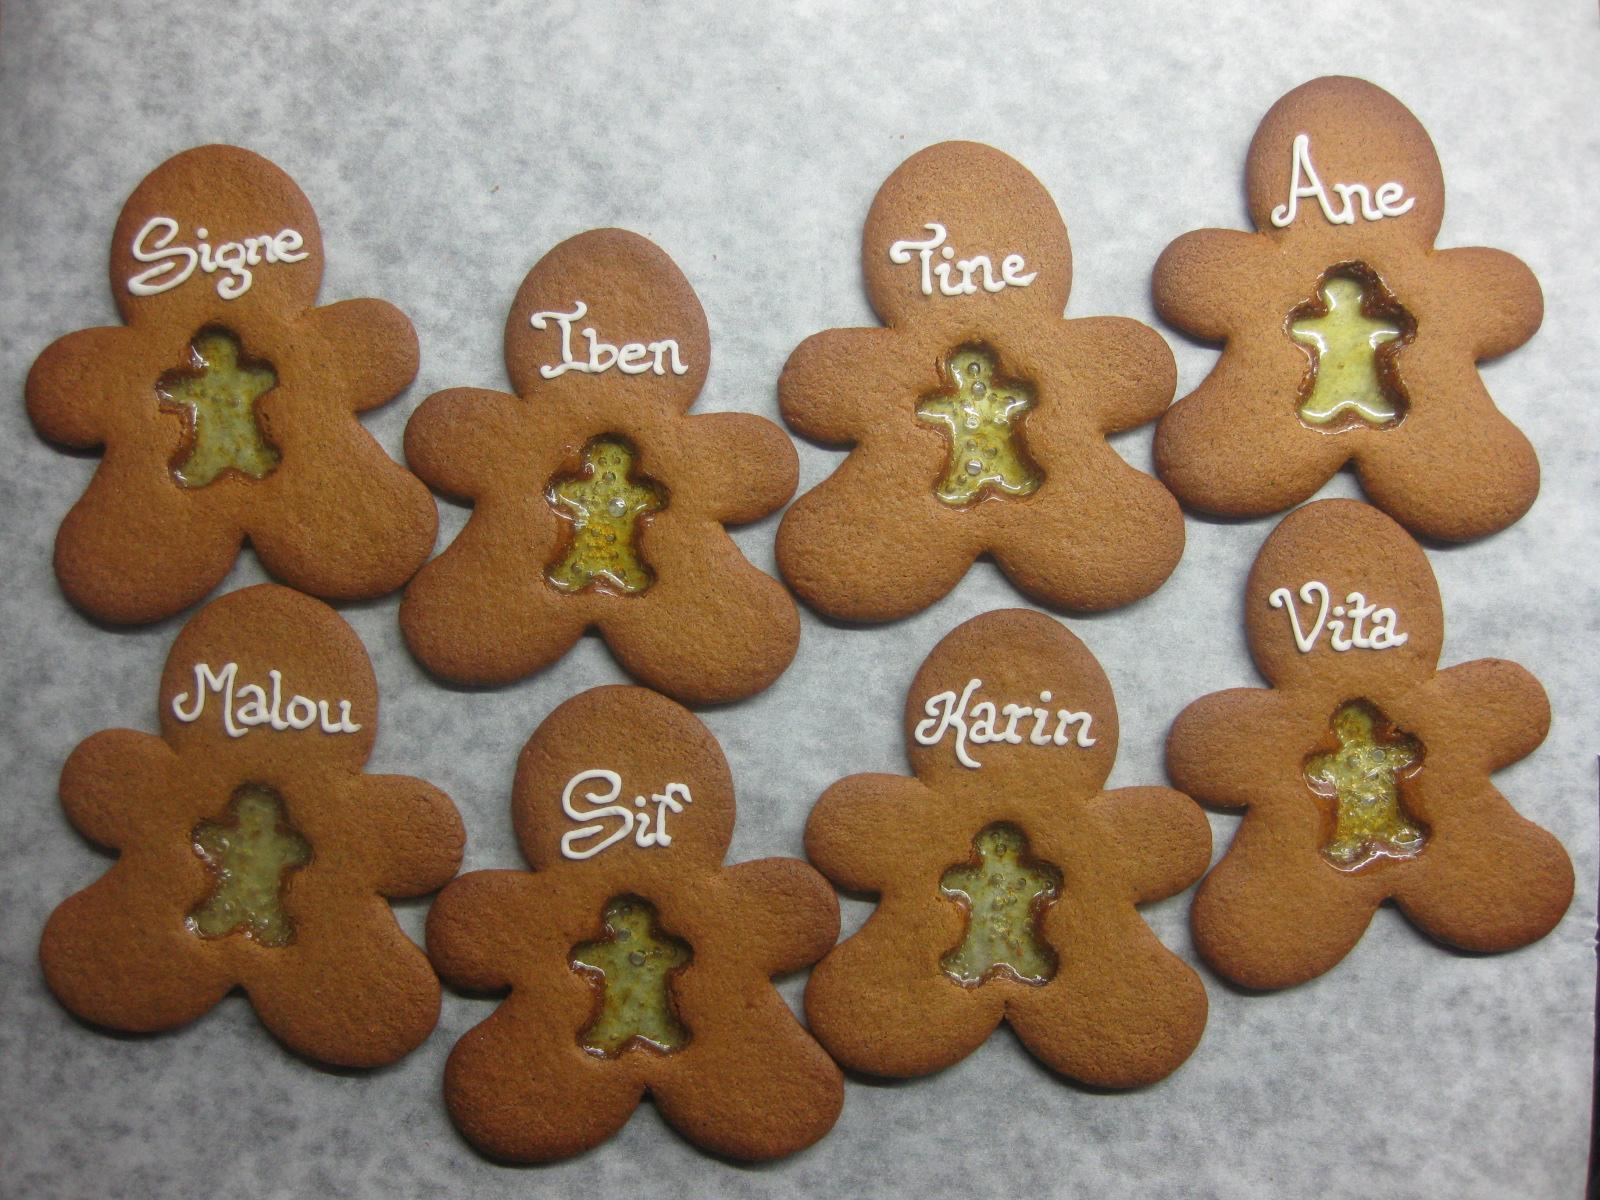 småkage fyldt med bolsche